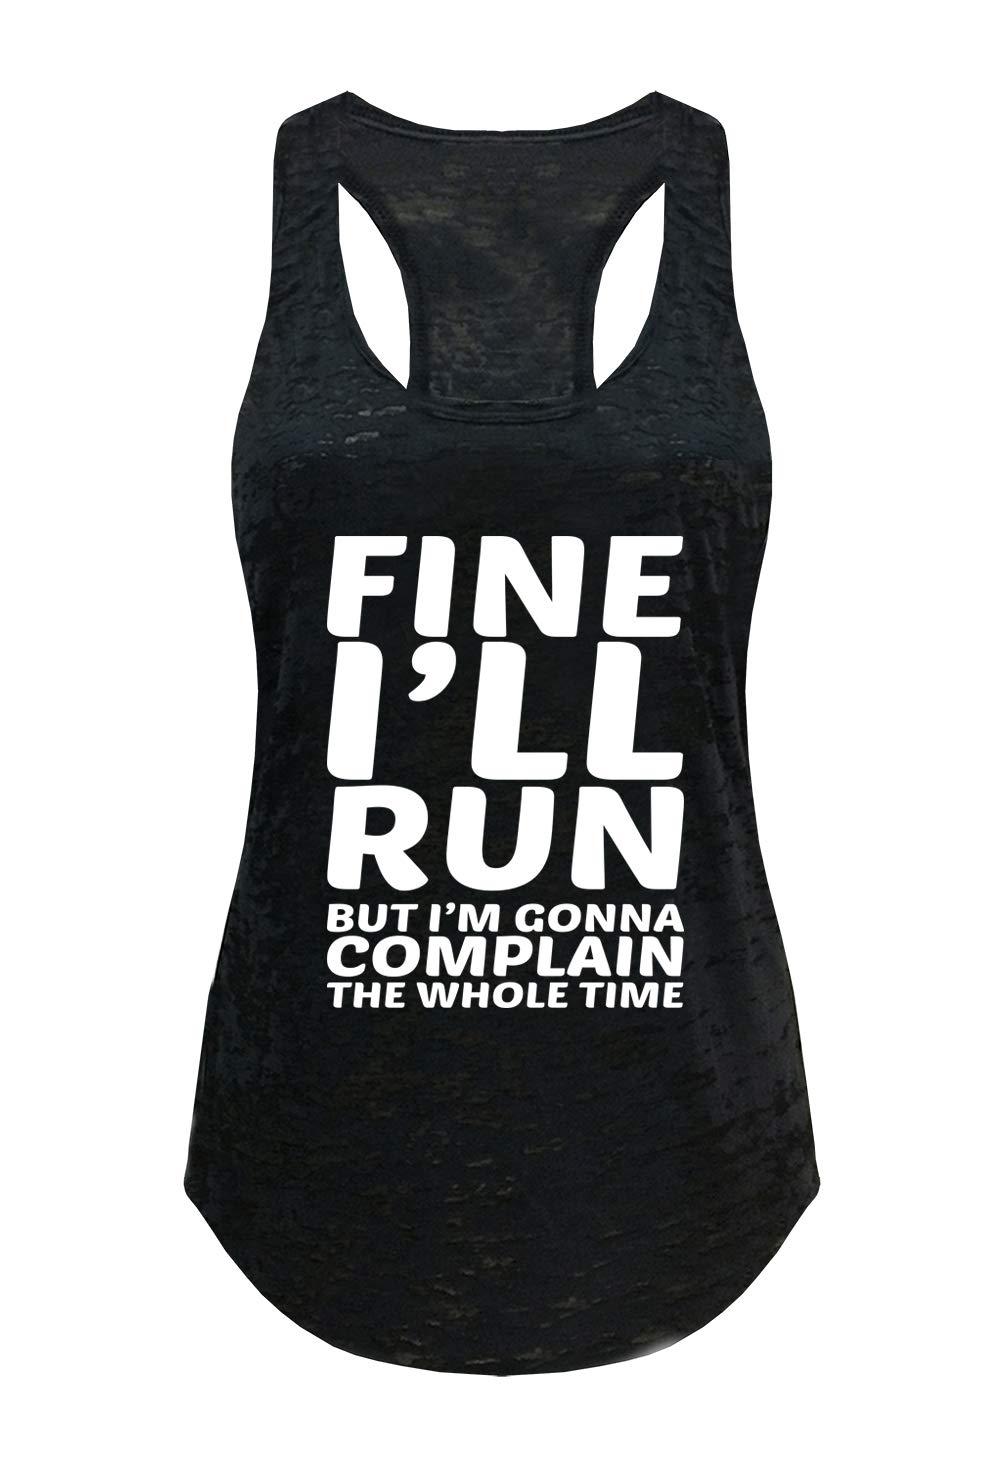 Tough Cookie's Women's Fine I'll Run Burnout Tank Top (Large - LF, Black)